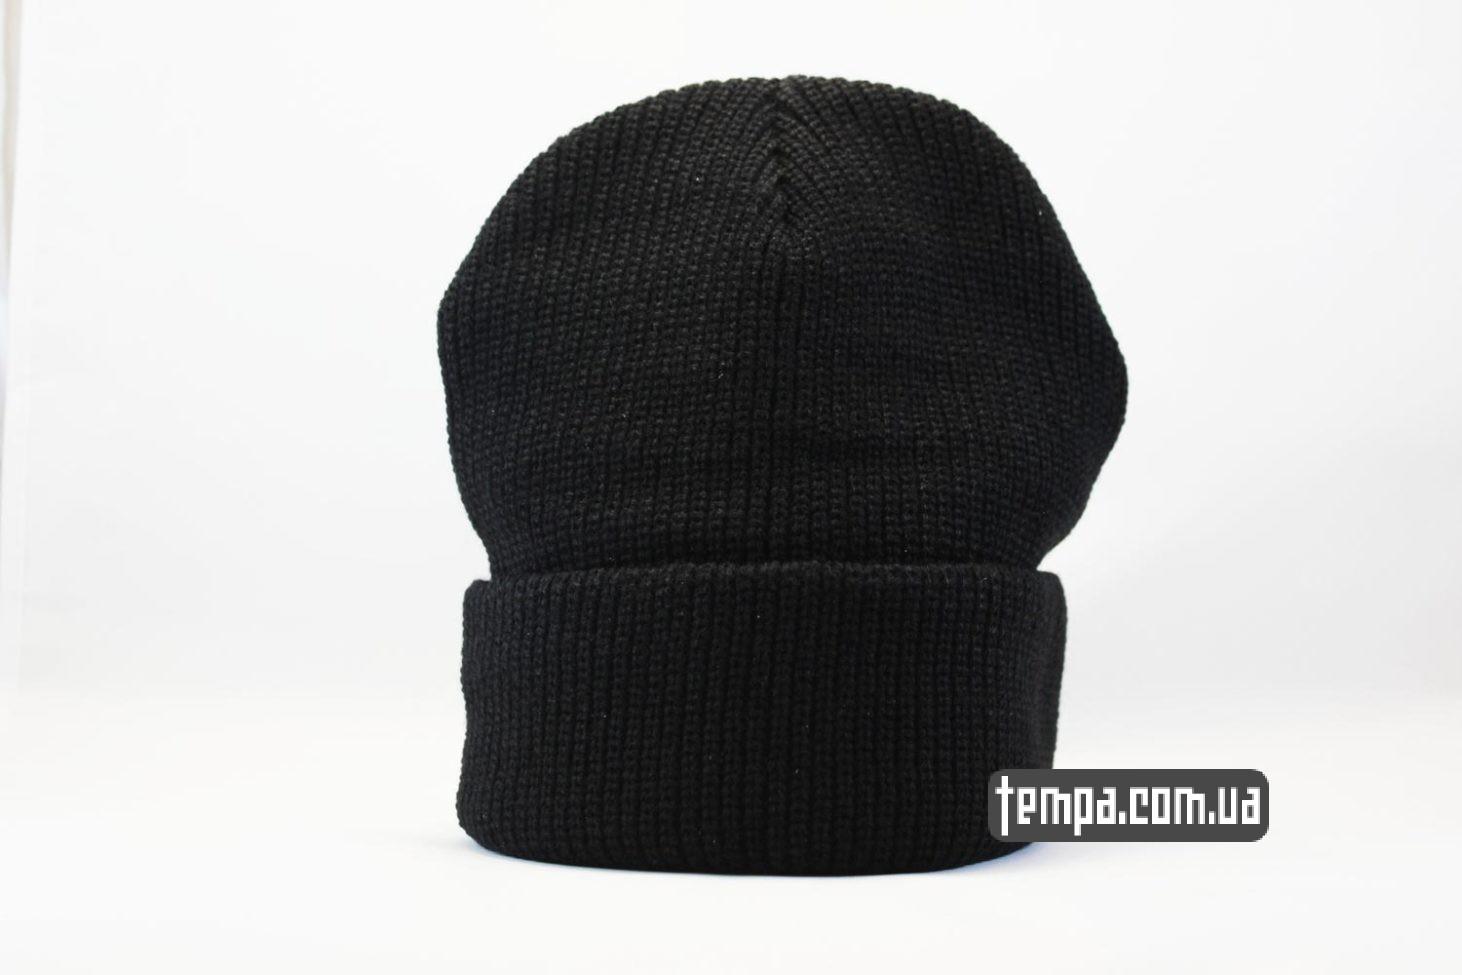 теплая зимняя шапка beanie STUSSY New York Los Angeles Tokyo купить магазин Украина